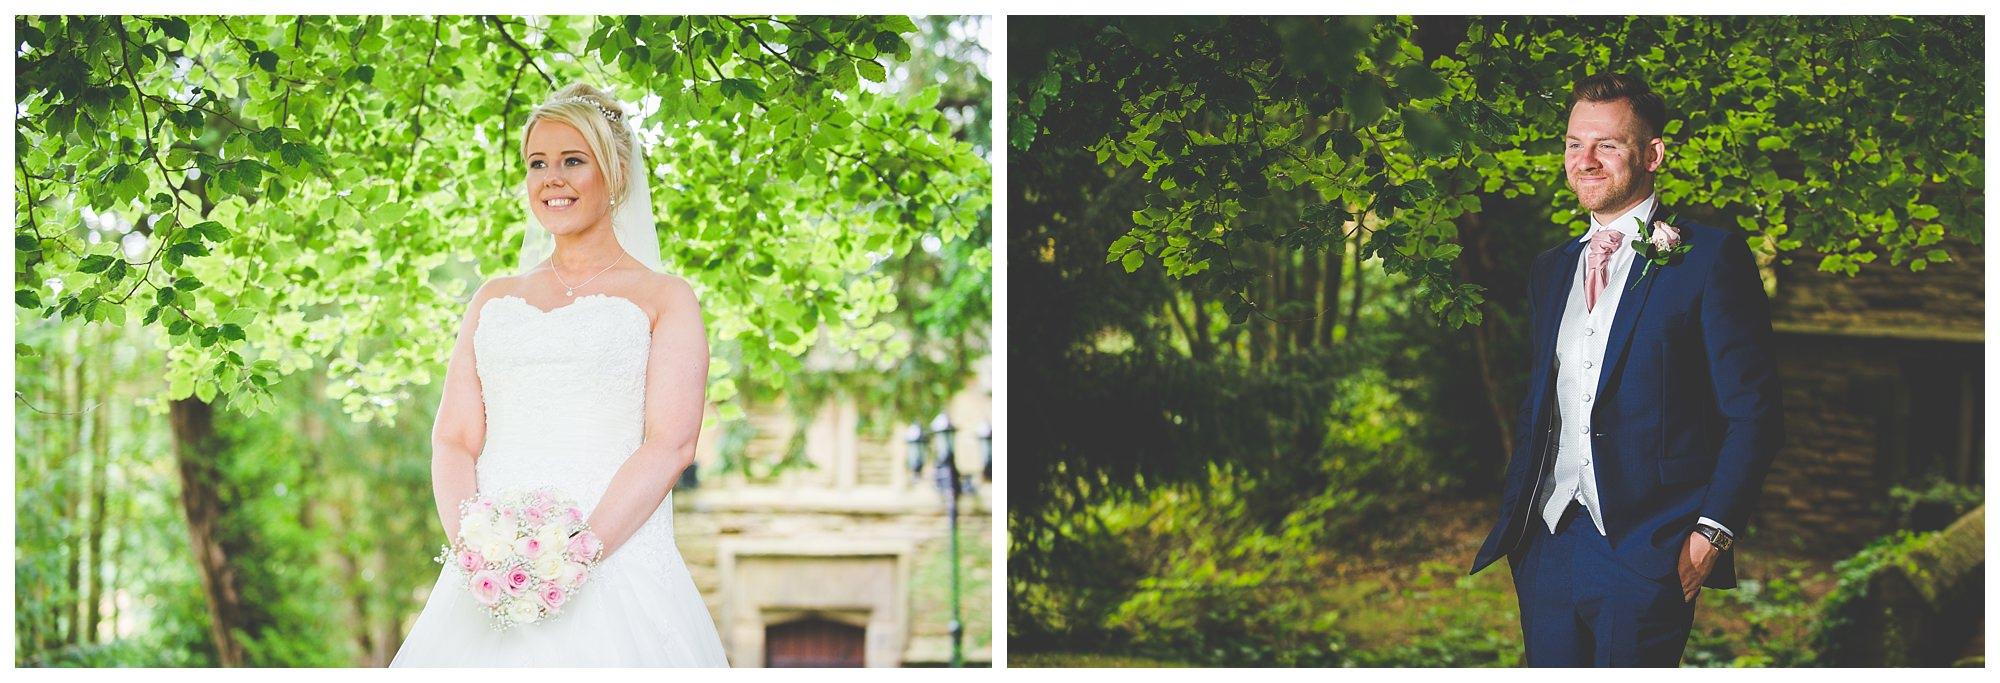 Bagden-Hall-Wedding-Photography_0038